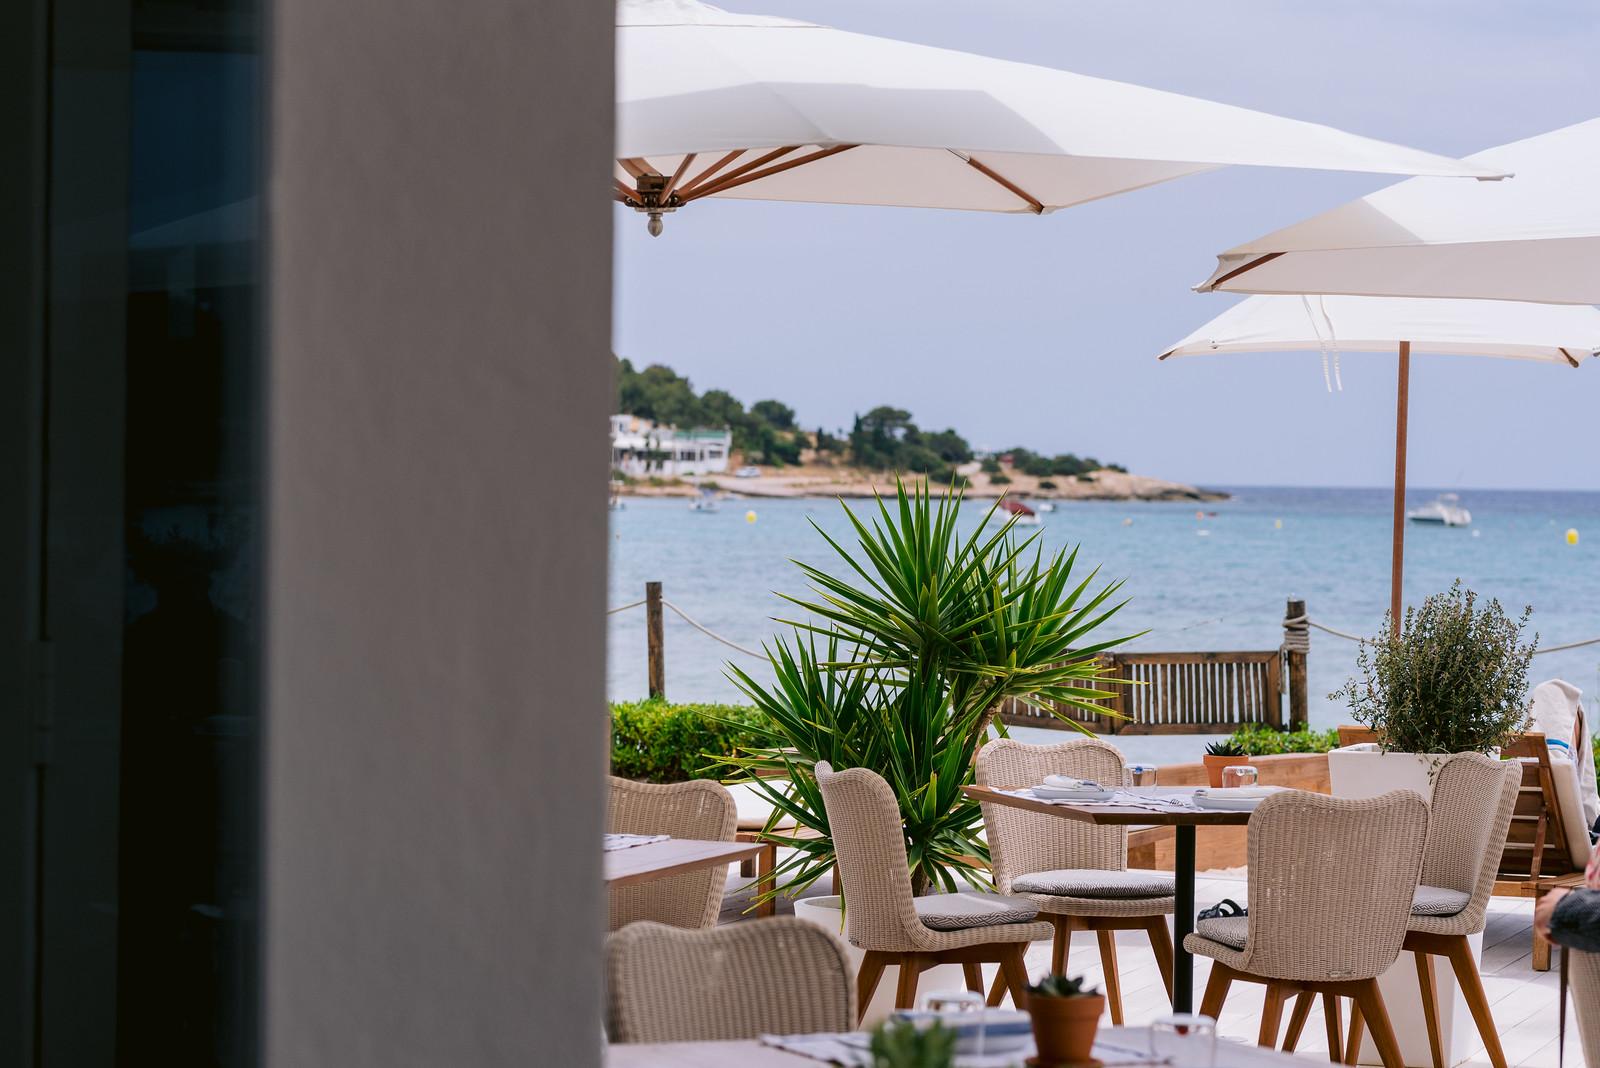 https://www.white-ibiza.com/wp-content/uploads/2021/06/white-ibiza-restaurants-bibo-ibiza-bay-08.jpg